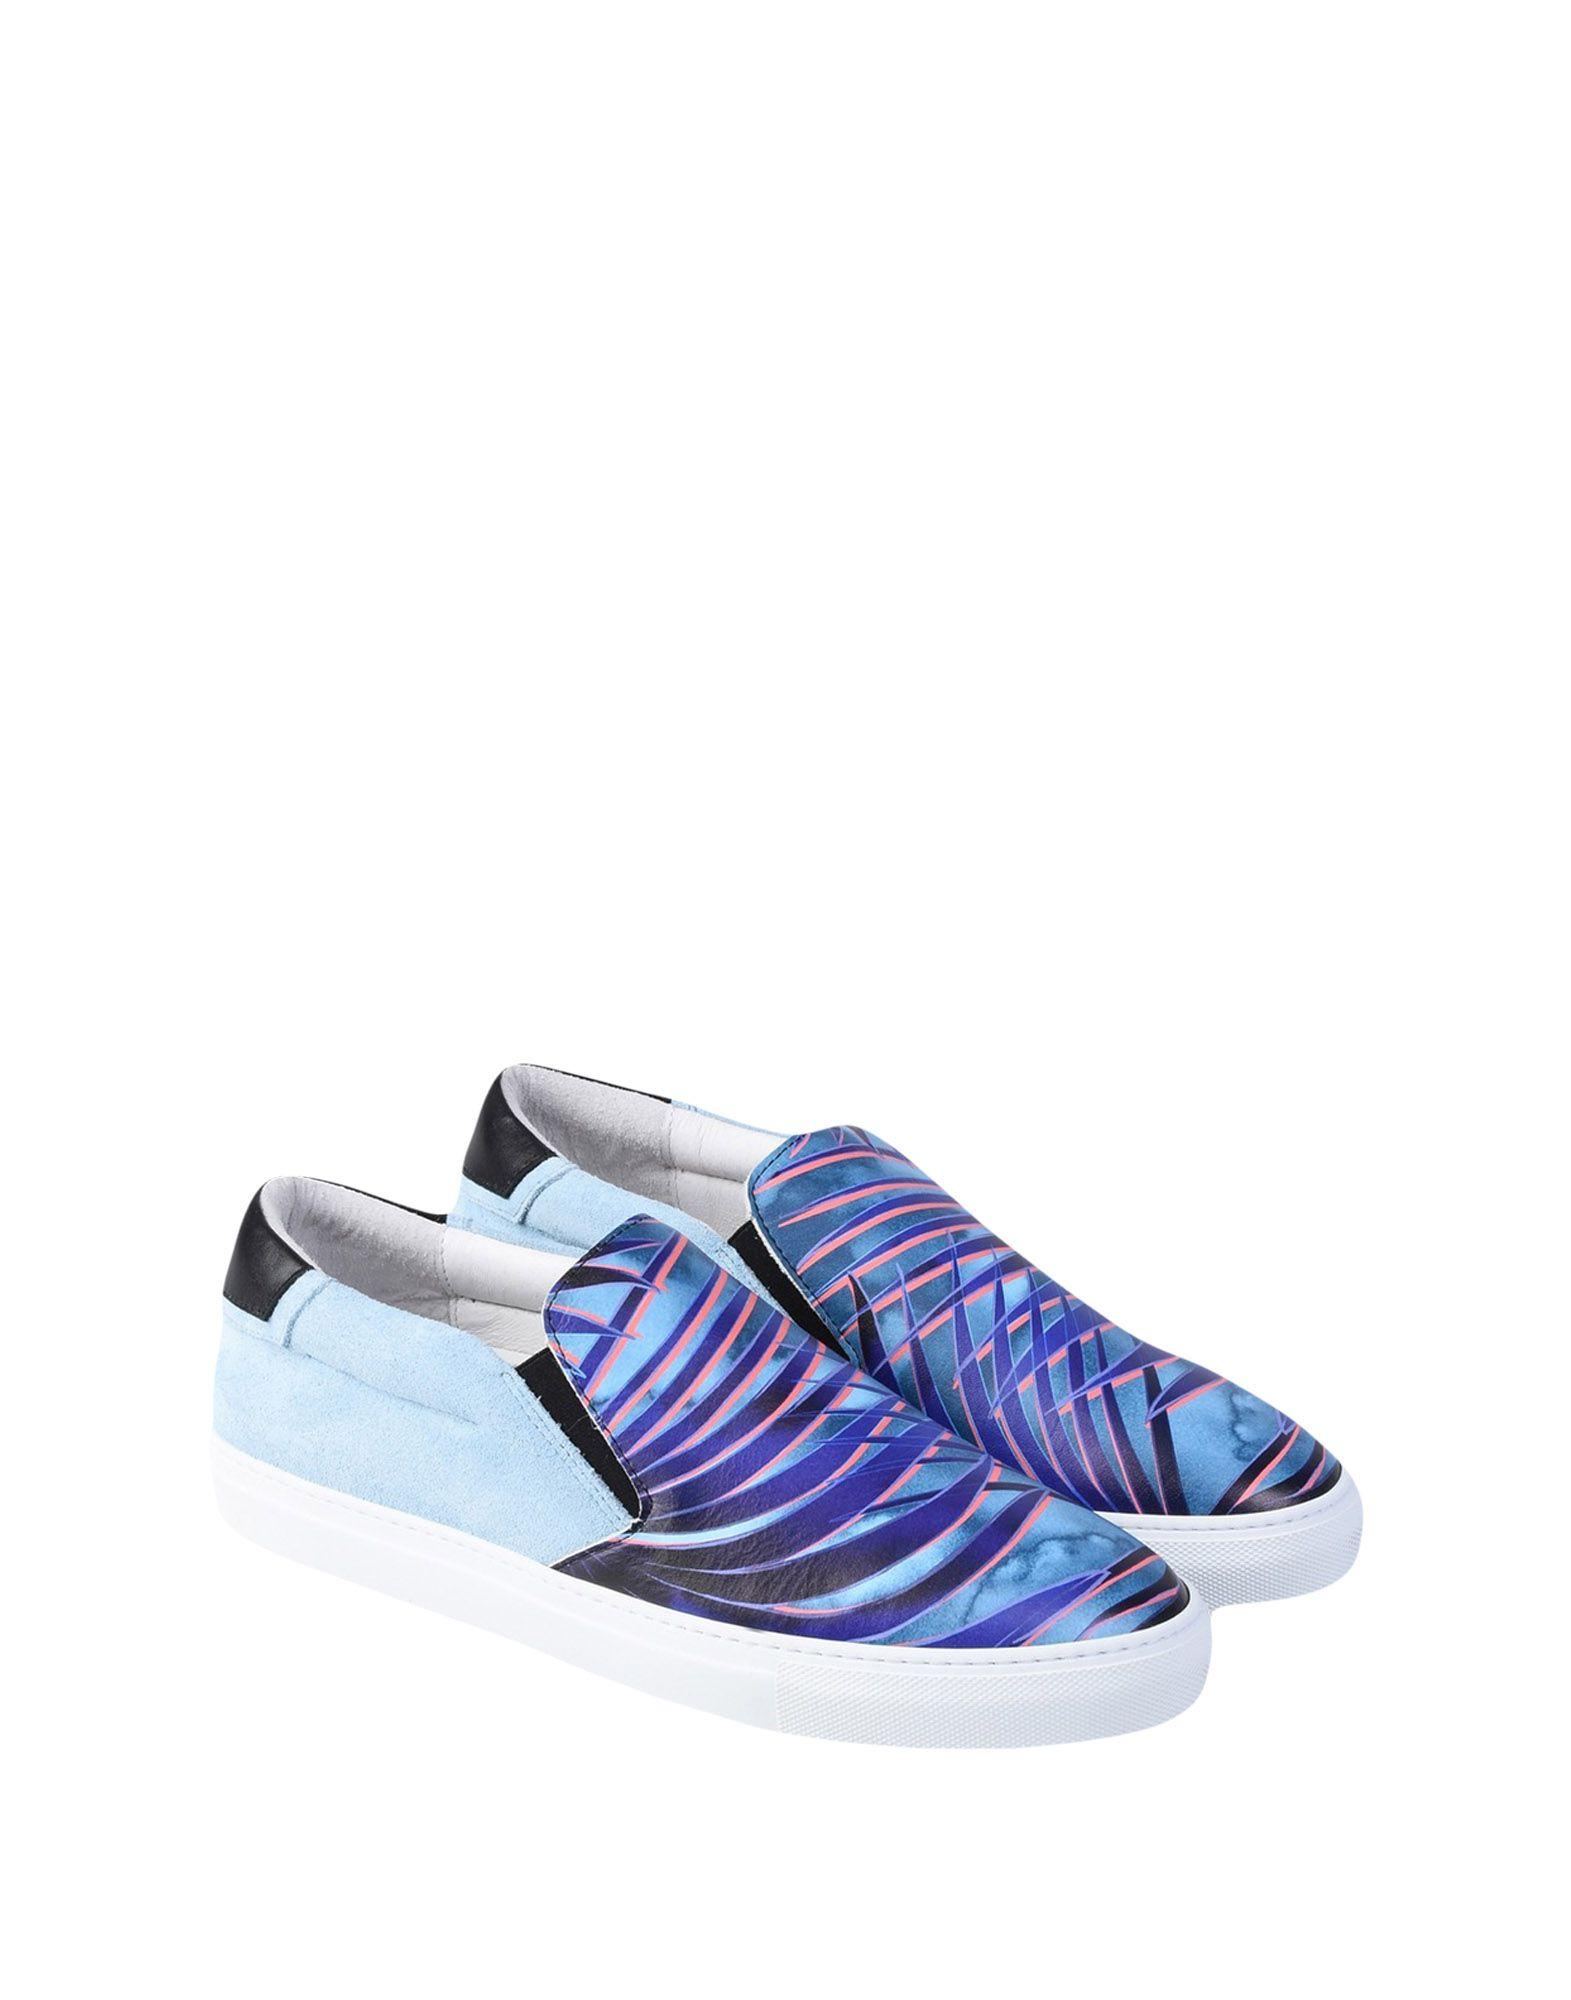 Sneakers Just Cavalli Uomo - 11394933OE